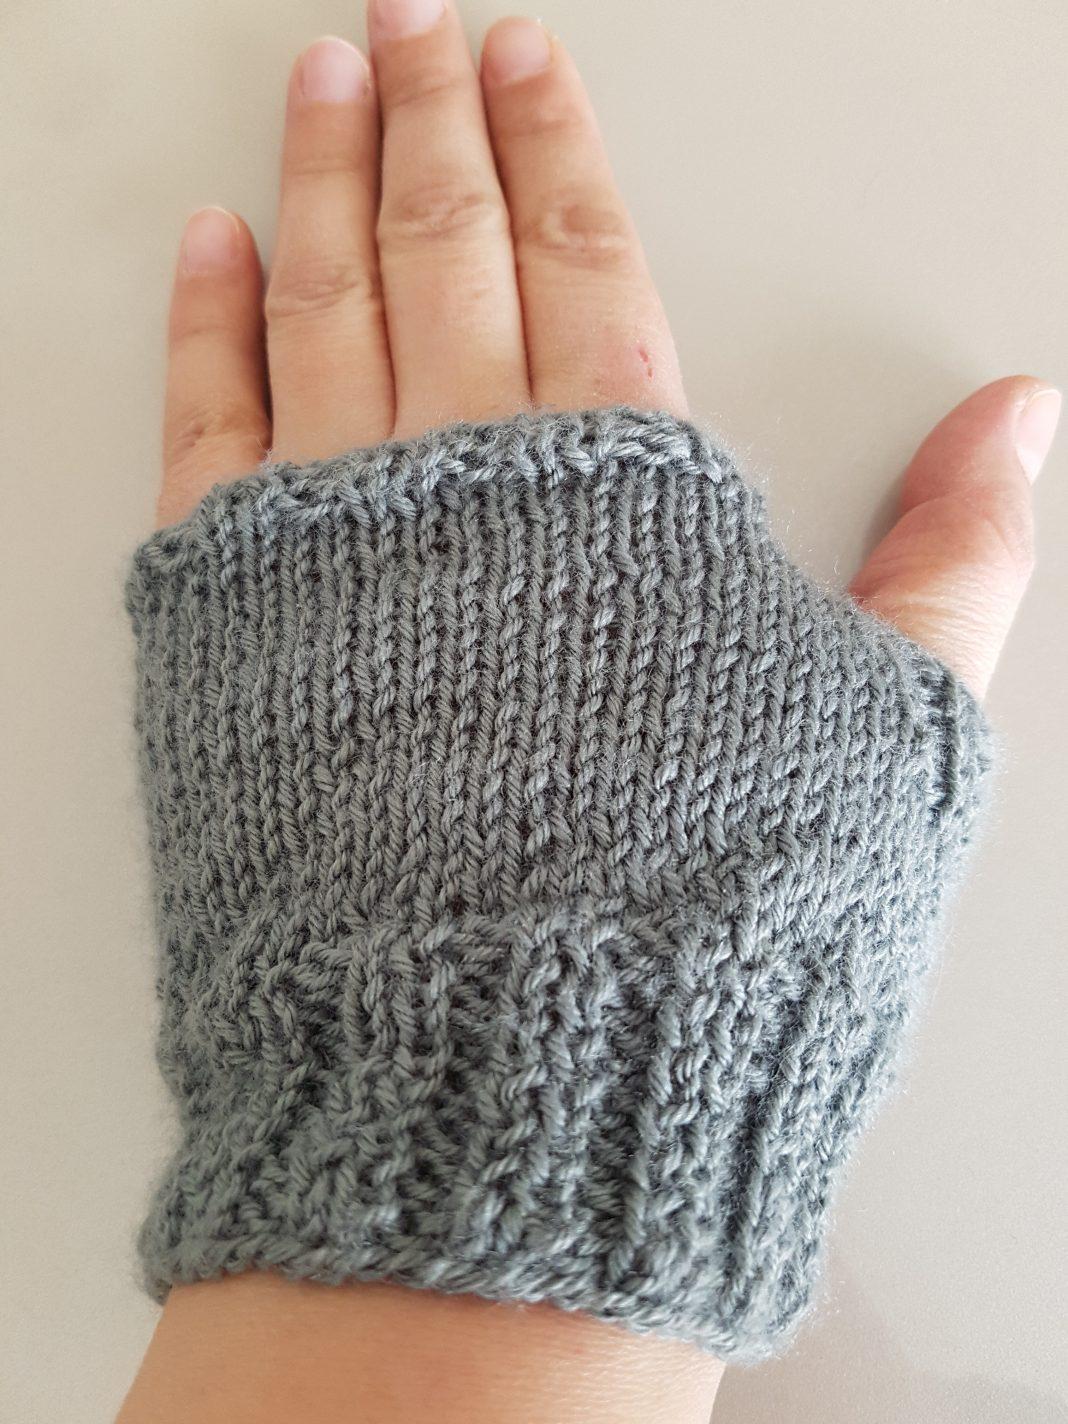 pratik-parmaksiz-eldiven-yapimi